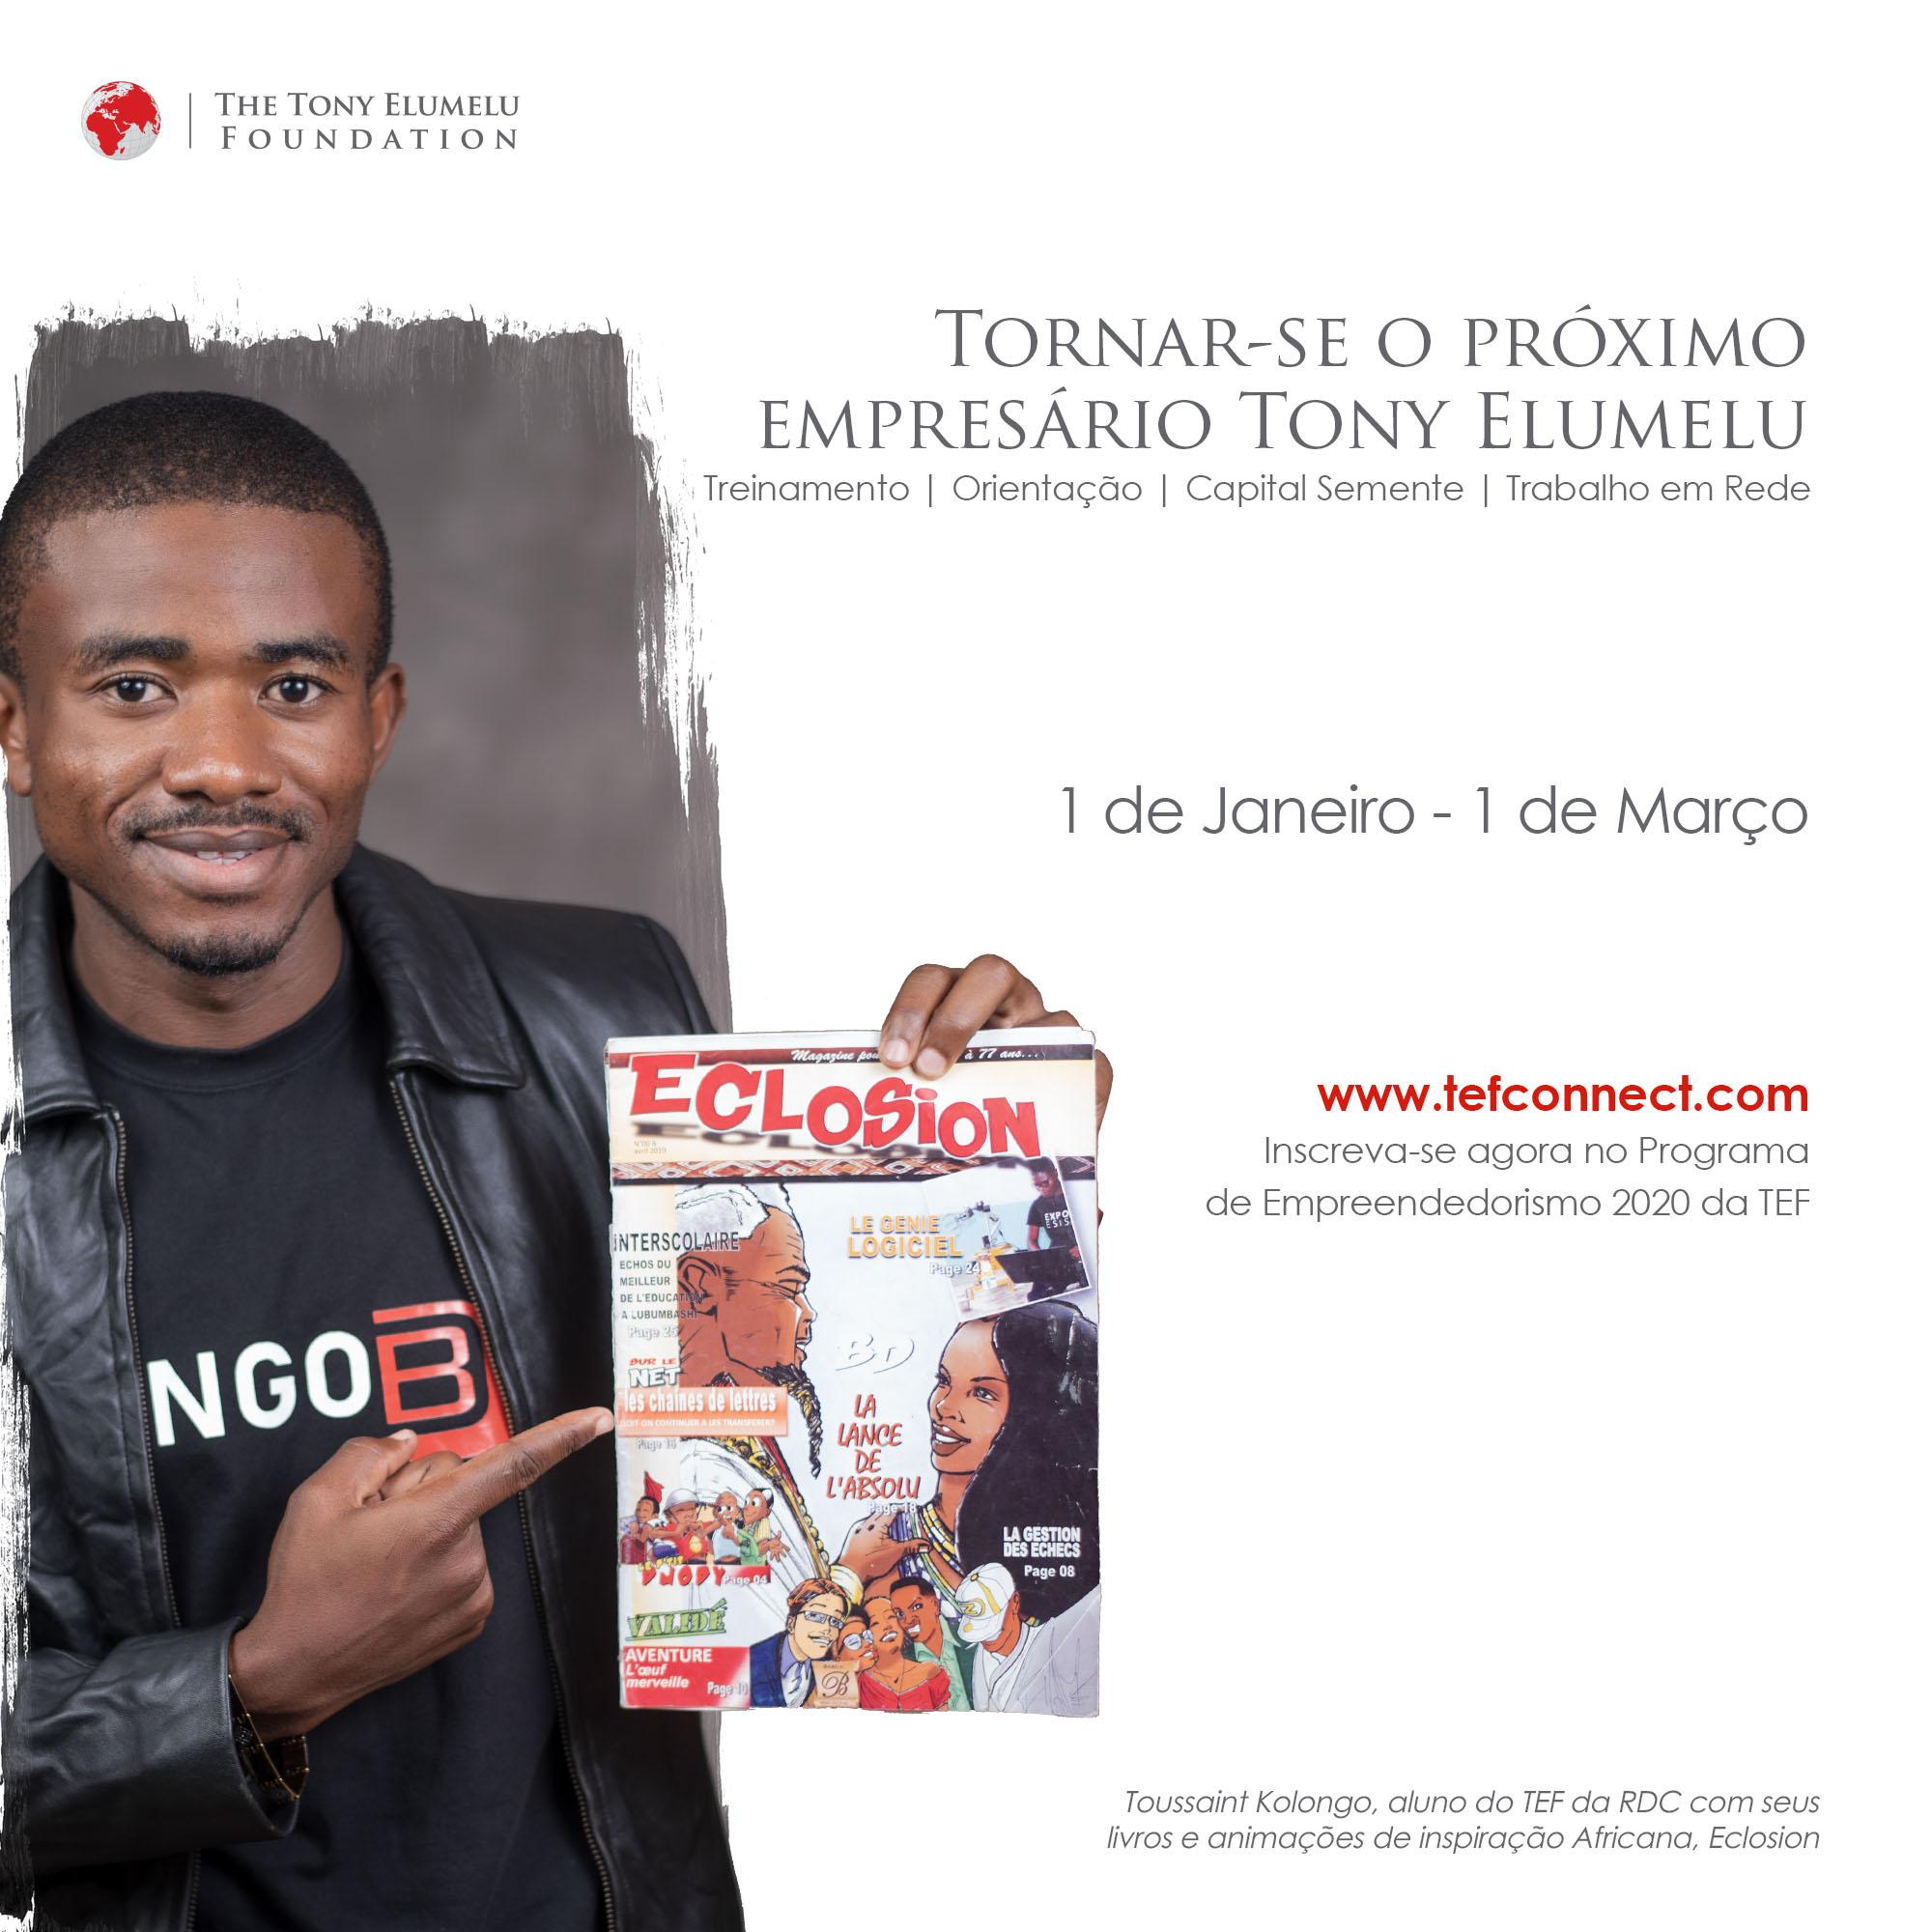 Chamando Startup African Entrepreneurs: Candidate-se ao Programa de Empreendedorismo Tony Elumelu Foundation 2020